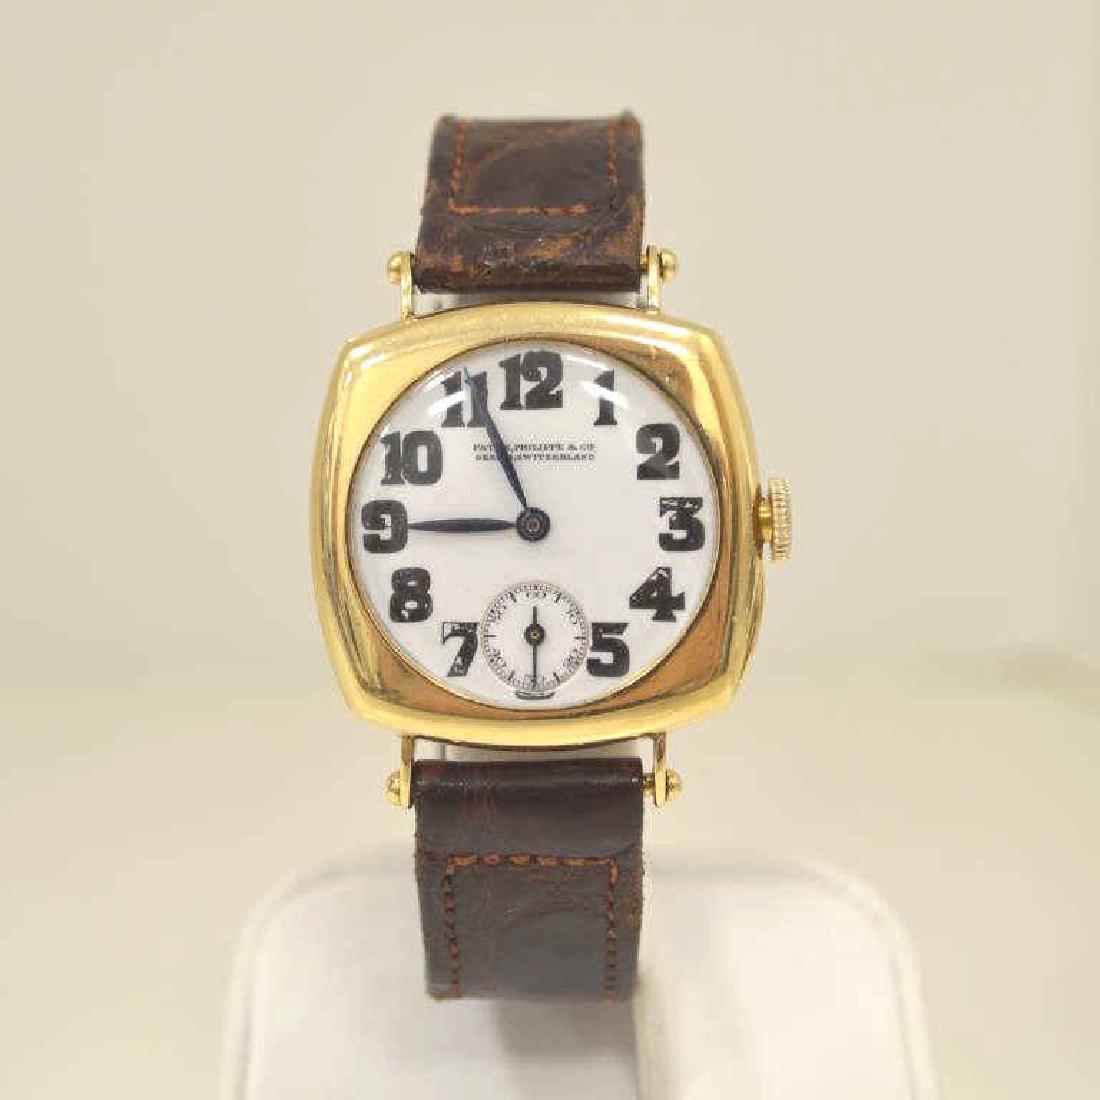 Vintage 18kt Patek Philippe Square Manual Watch